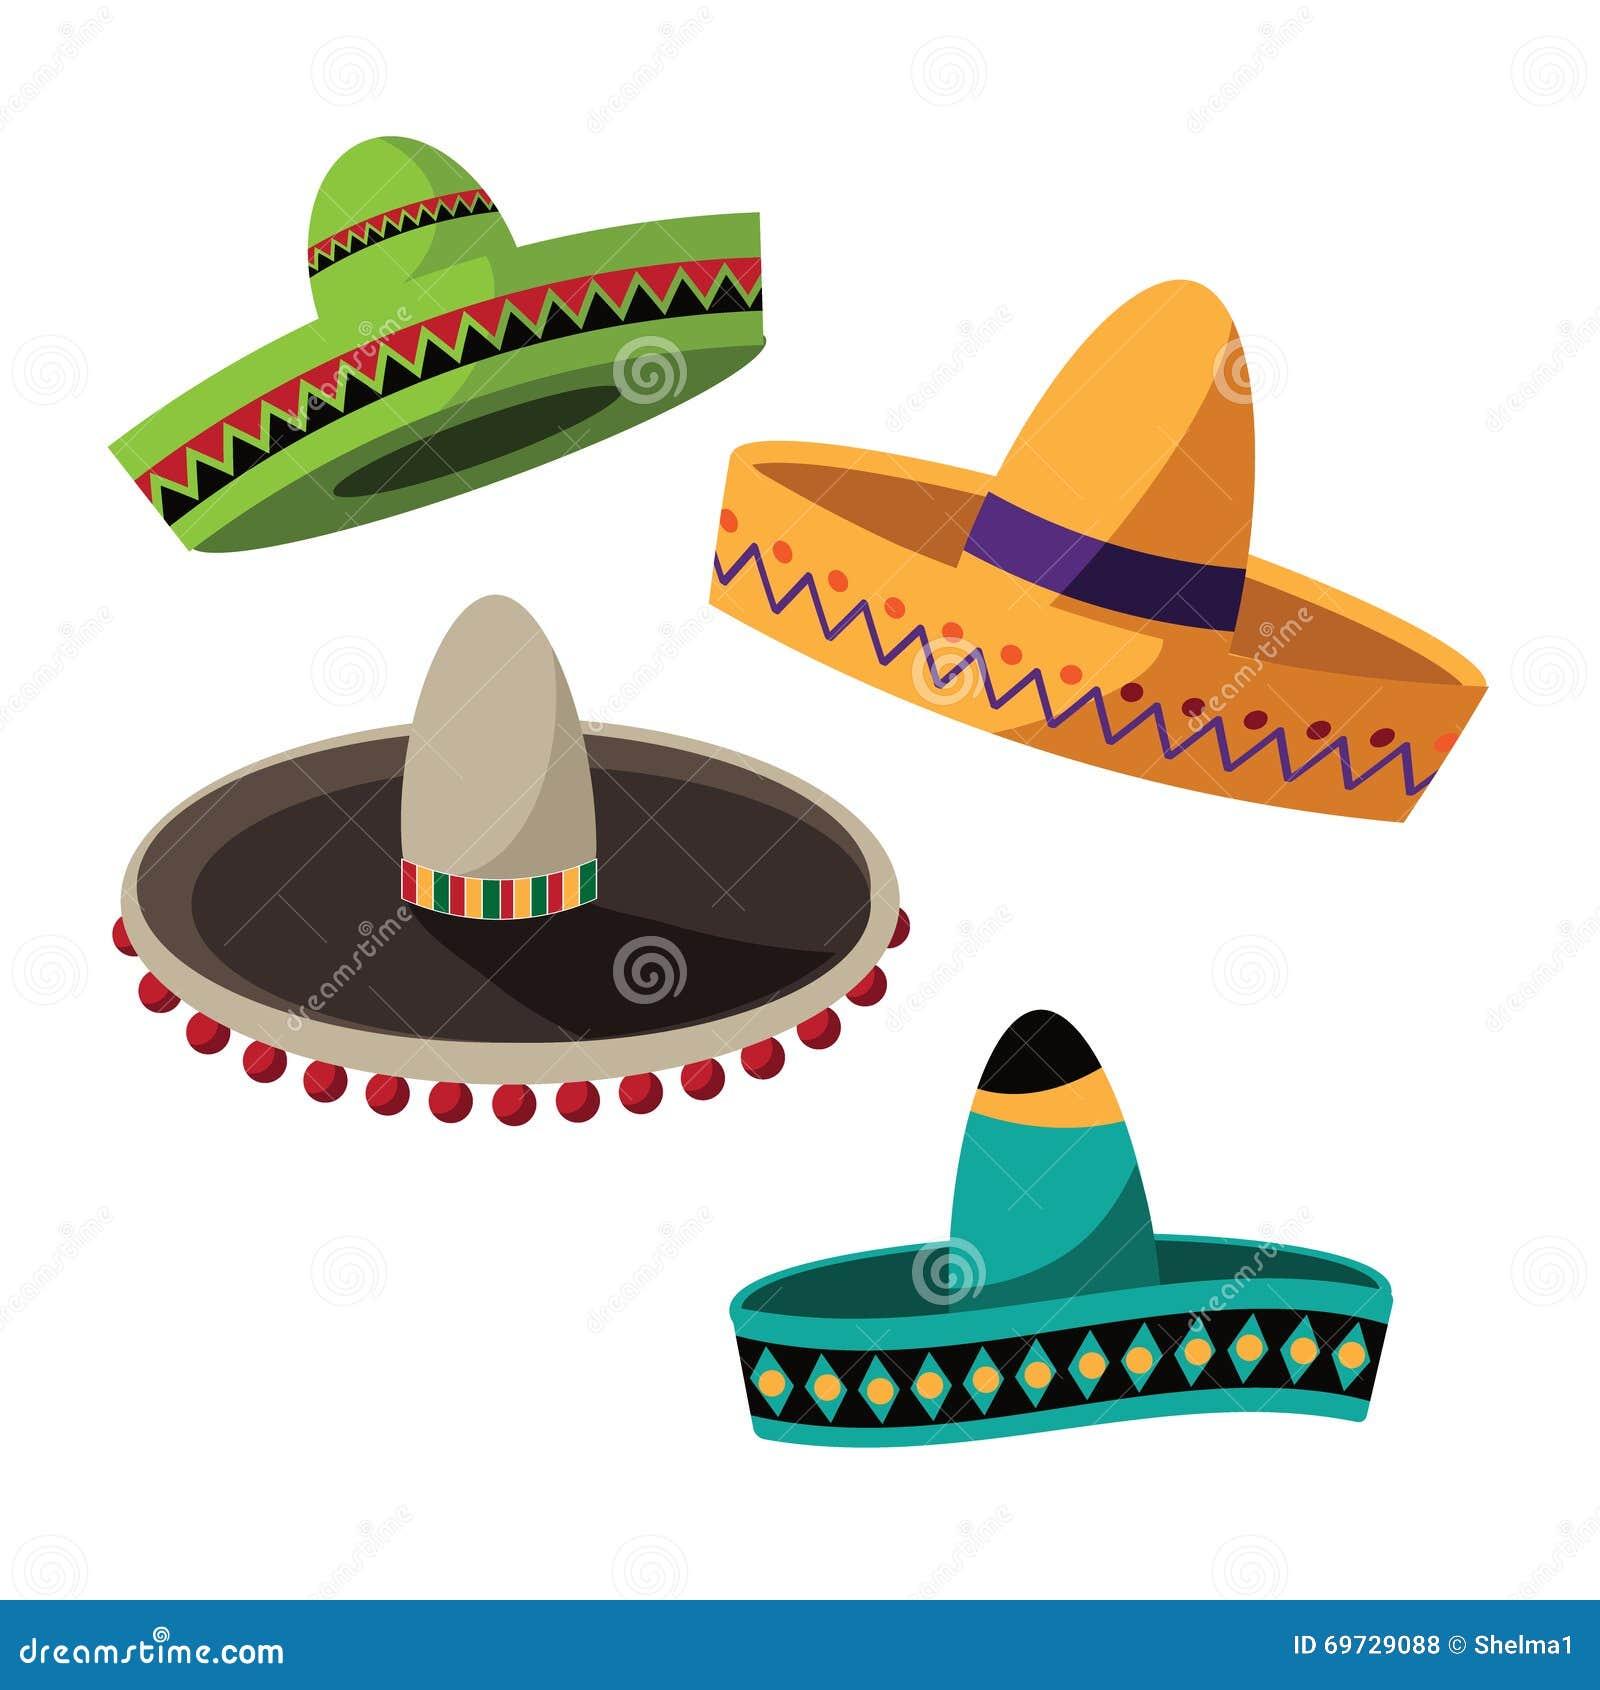 cinco de mayo sombrero flat design collection stock vector image 69729088. Black Bedroom Furniture Sets. Home Design Ideas